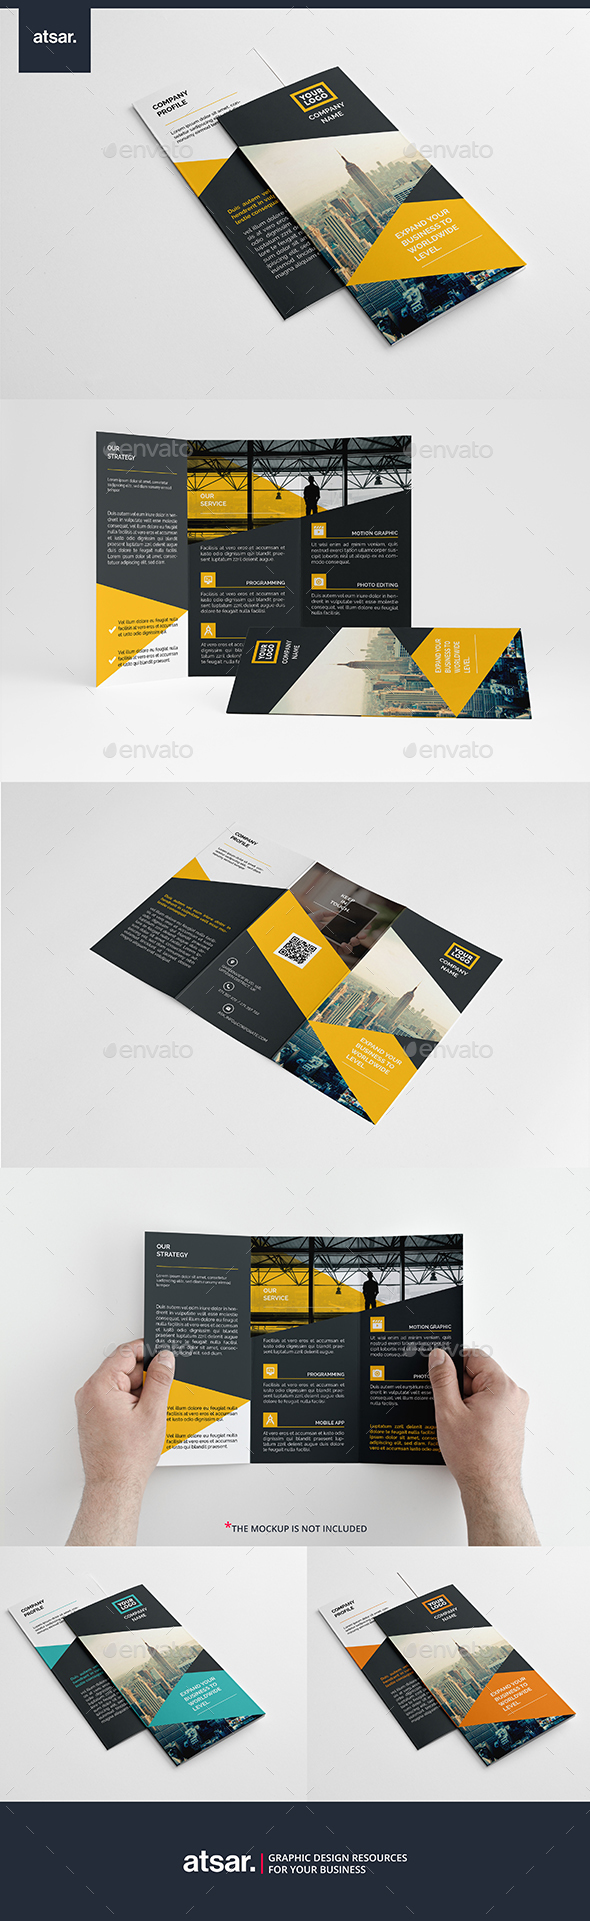 Futura Trifold Template - Corporate Brochures